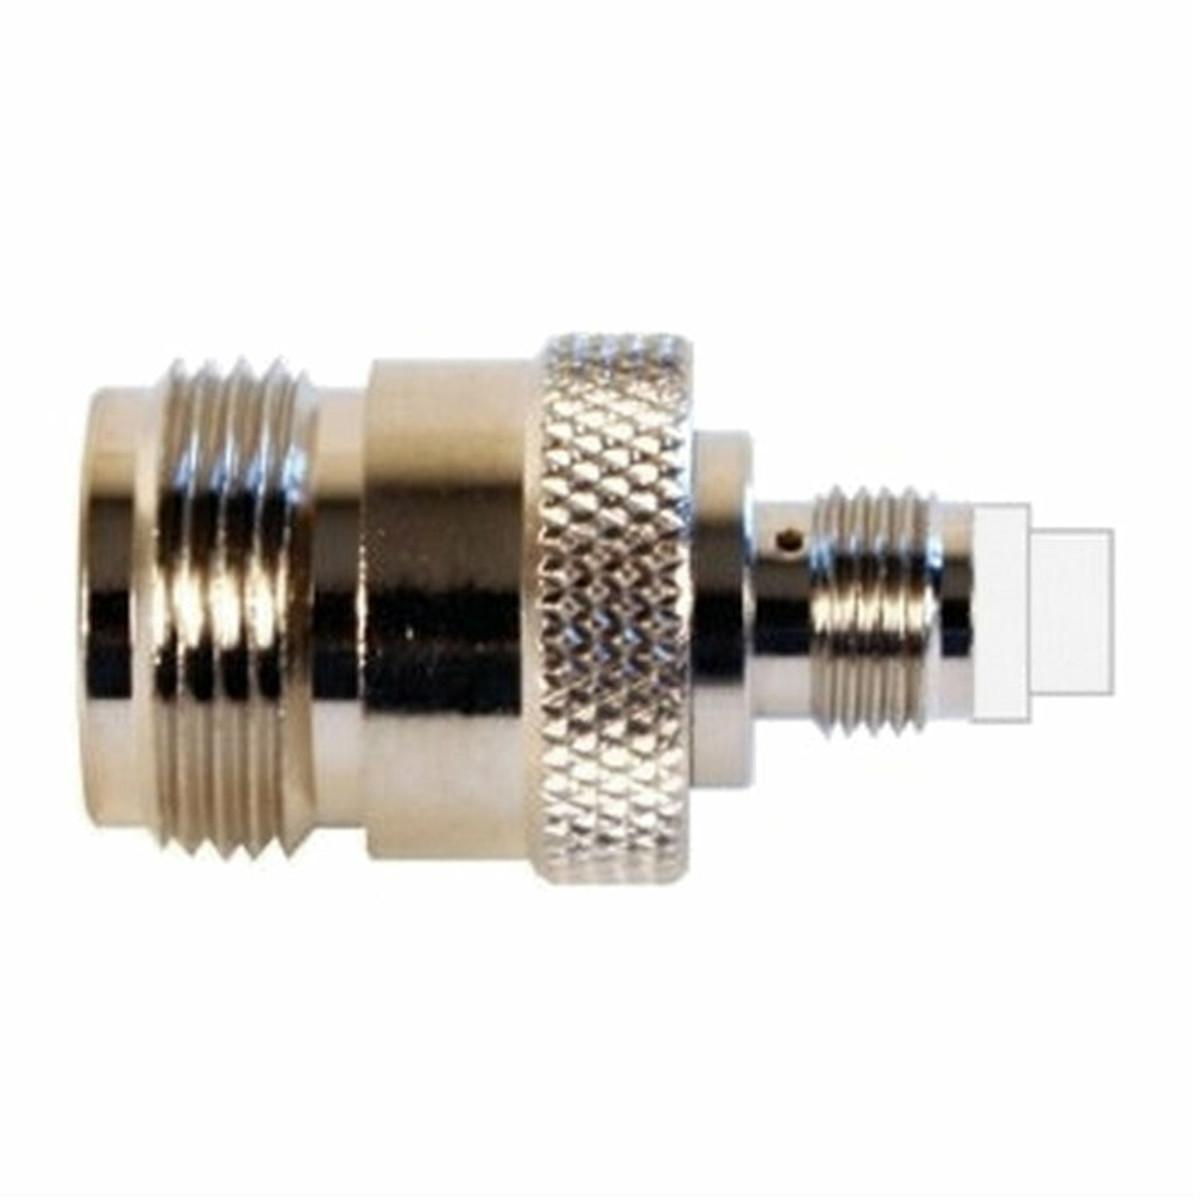 weBoost (Wilson) 971107 N-Female to FME-Female Connector